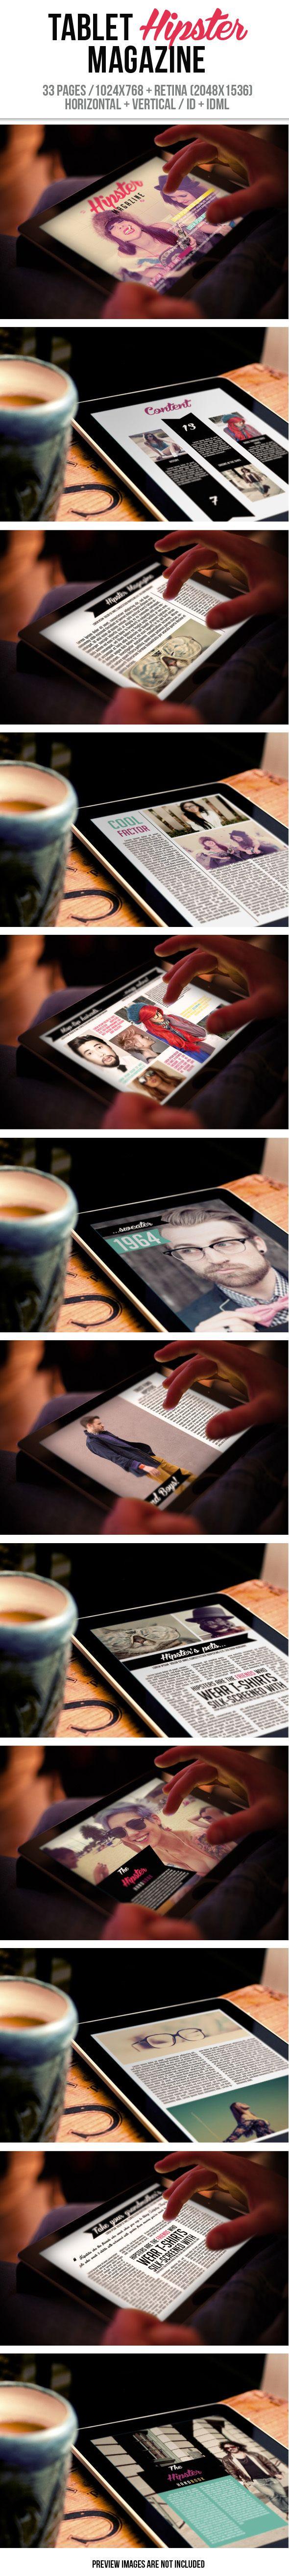 Tablet Hipster Magazine on Behance